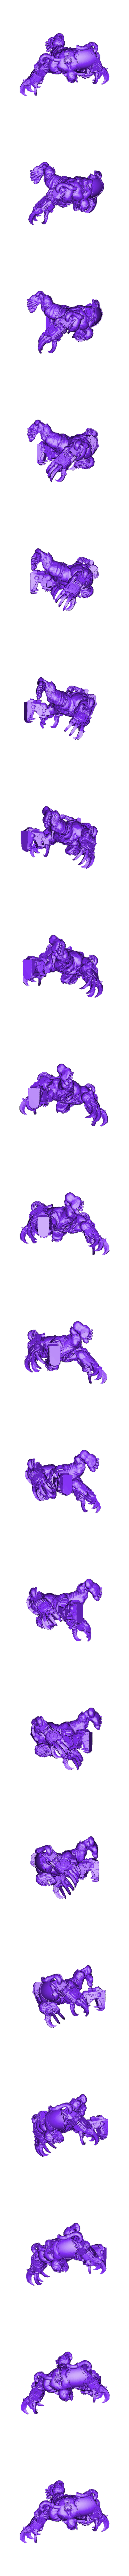 Double_Klaw_Git_Nob.stl Télécharger fichier STL gratuit Ultra Hulky Mega Ork Nob • Plan imprimable en 3D, 40Emperor